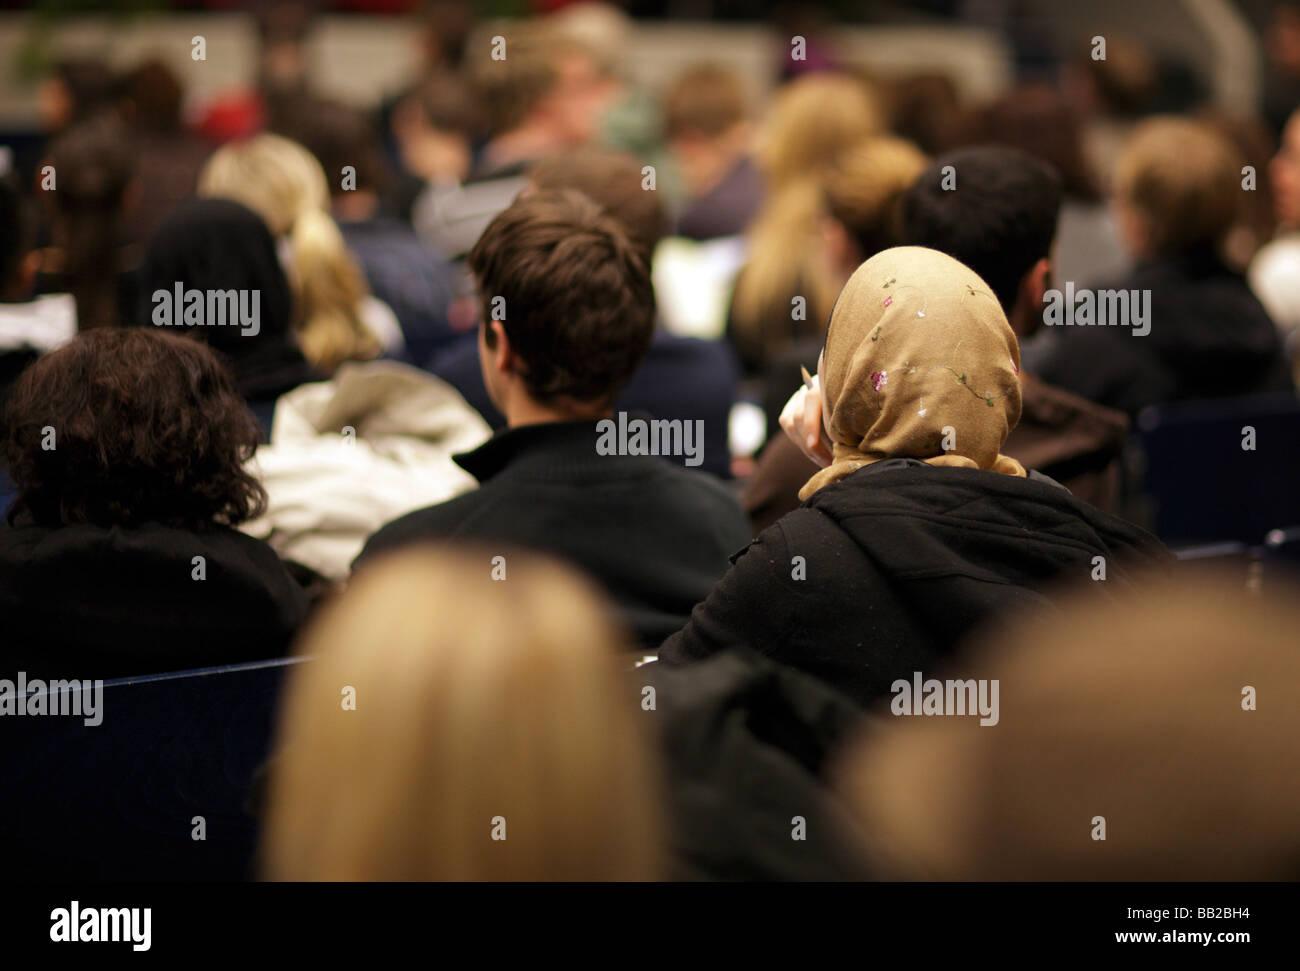 Studenten in einem Hoersaal an der Technischen Universitaet Berlin Deutschland Students at Technical University - Stock Image